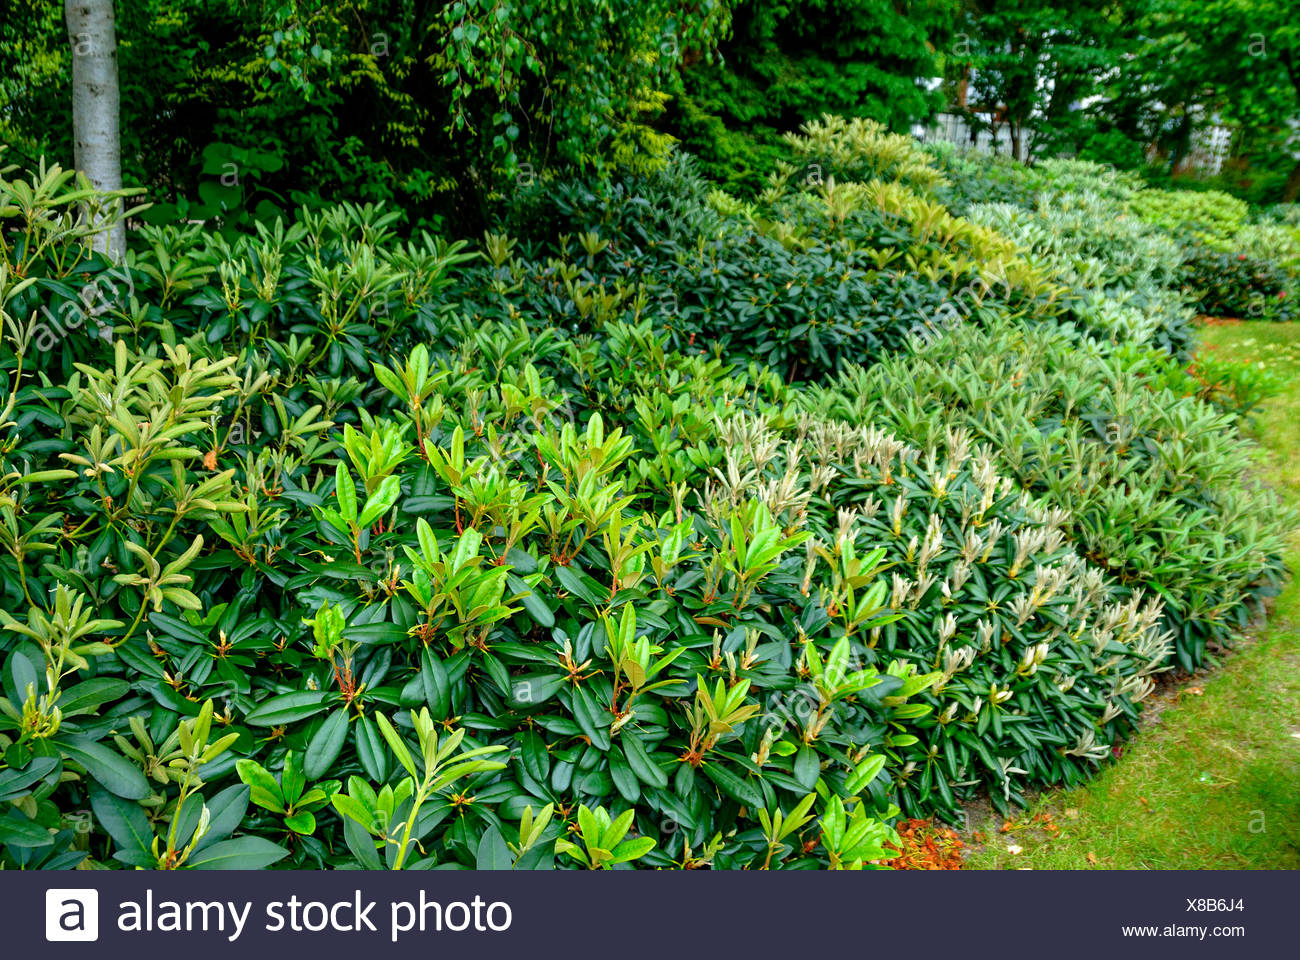 Yak Rhododendron, Yakushima Rhododendron (Rhododendron yakushimanum), in rhododendron garden - Stock Image